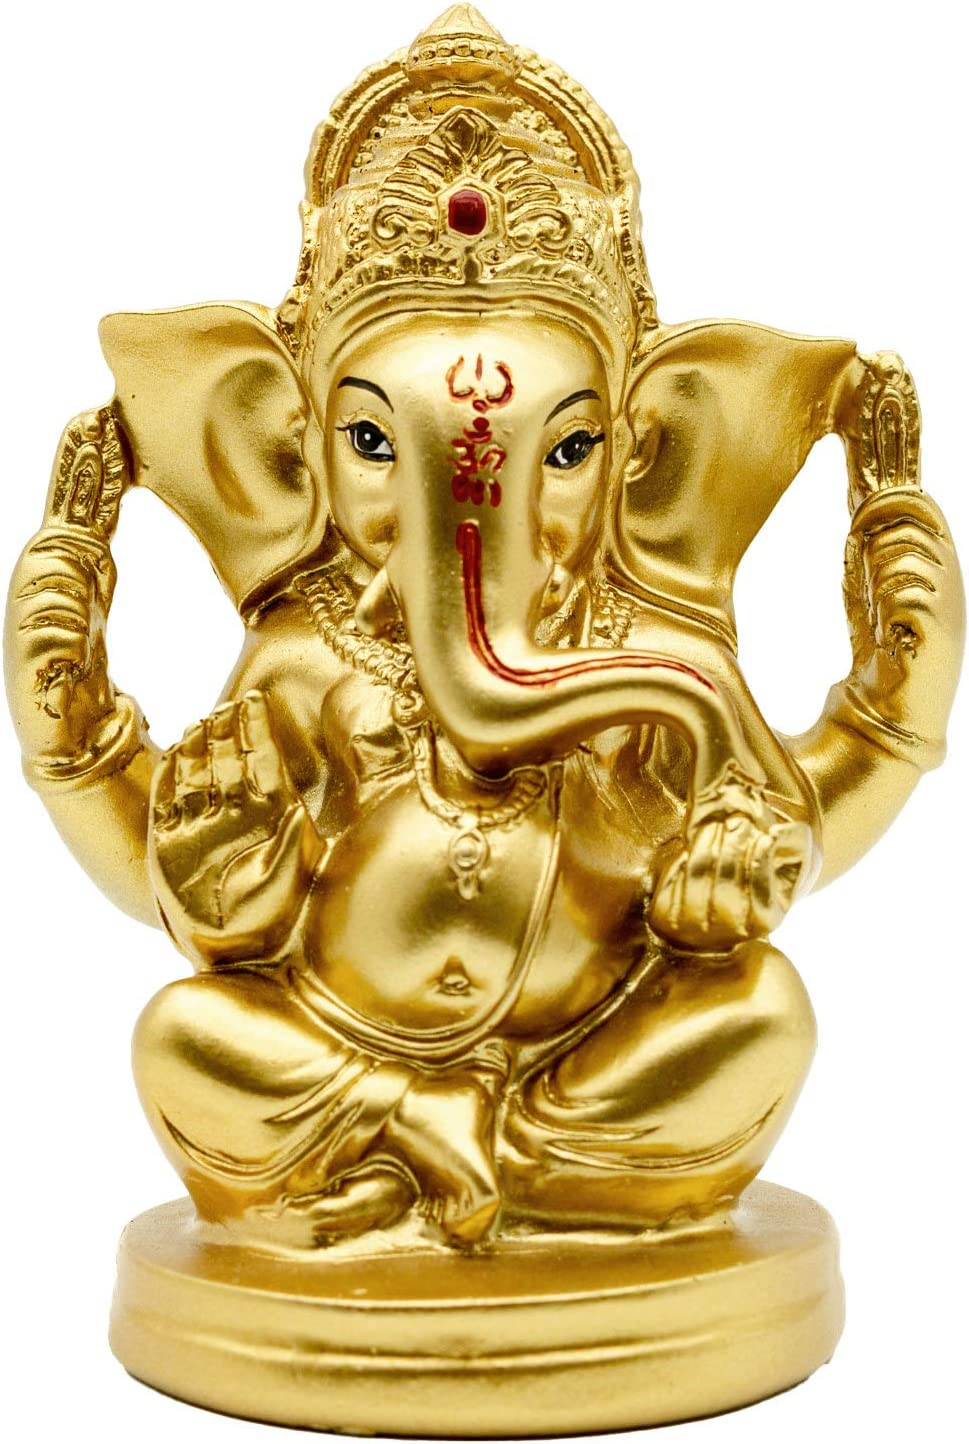 Hindu God Lord Ganesha Idol - Indian Ganesh Sculpture Elephant Statue - India Meditation Mandir Temple Puja Items